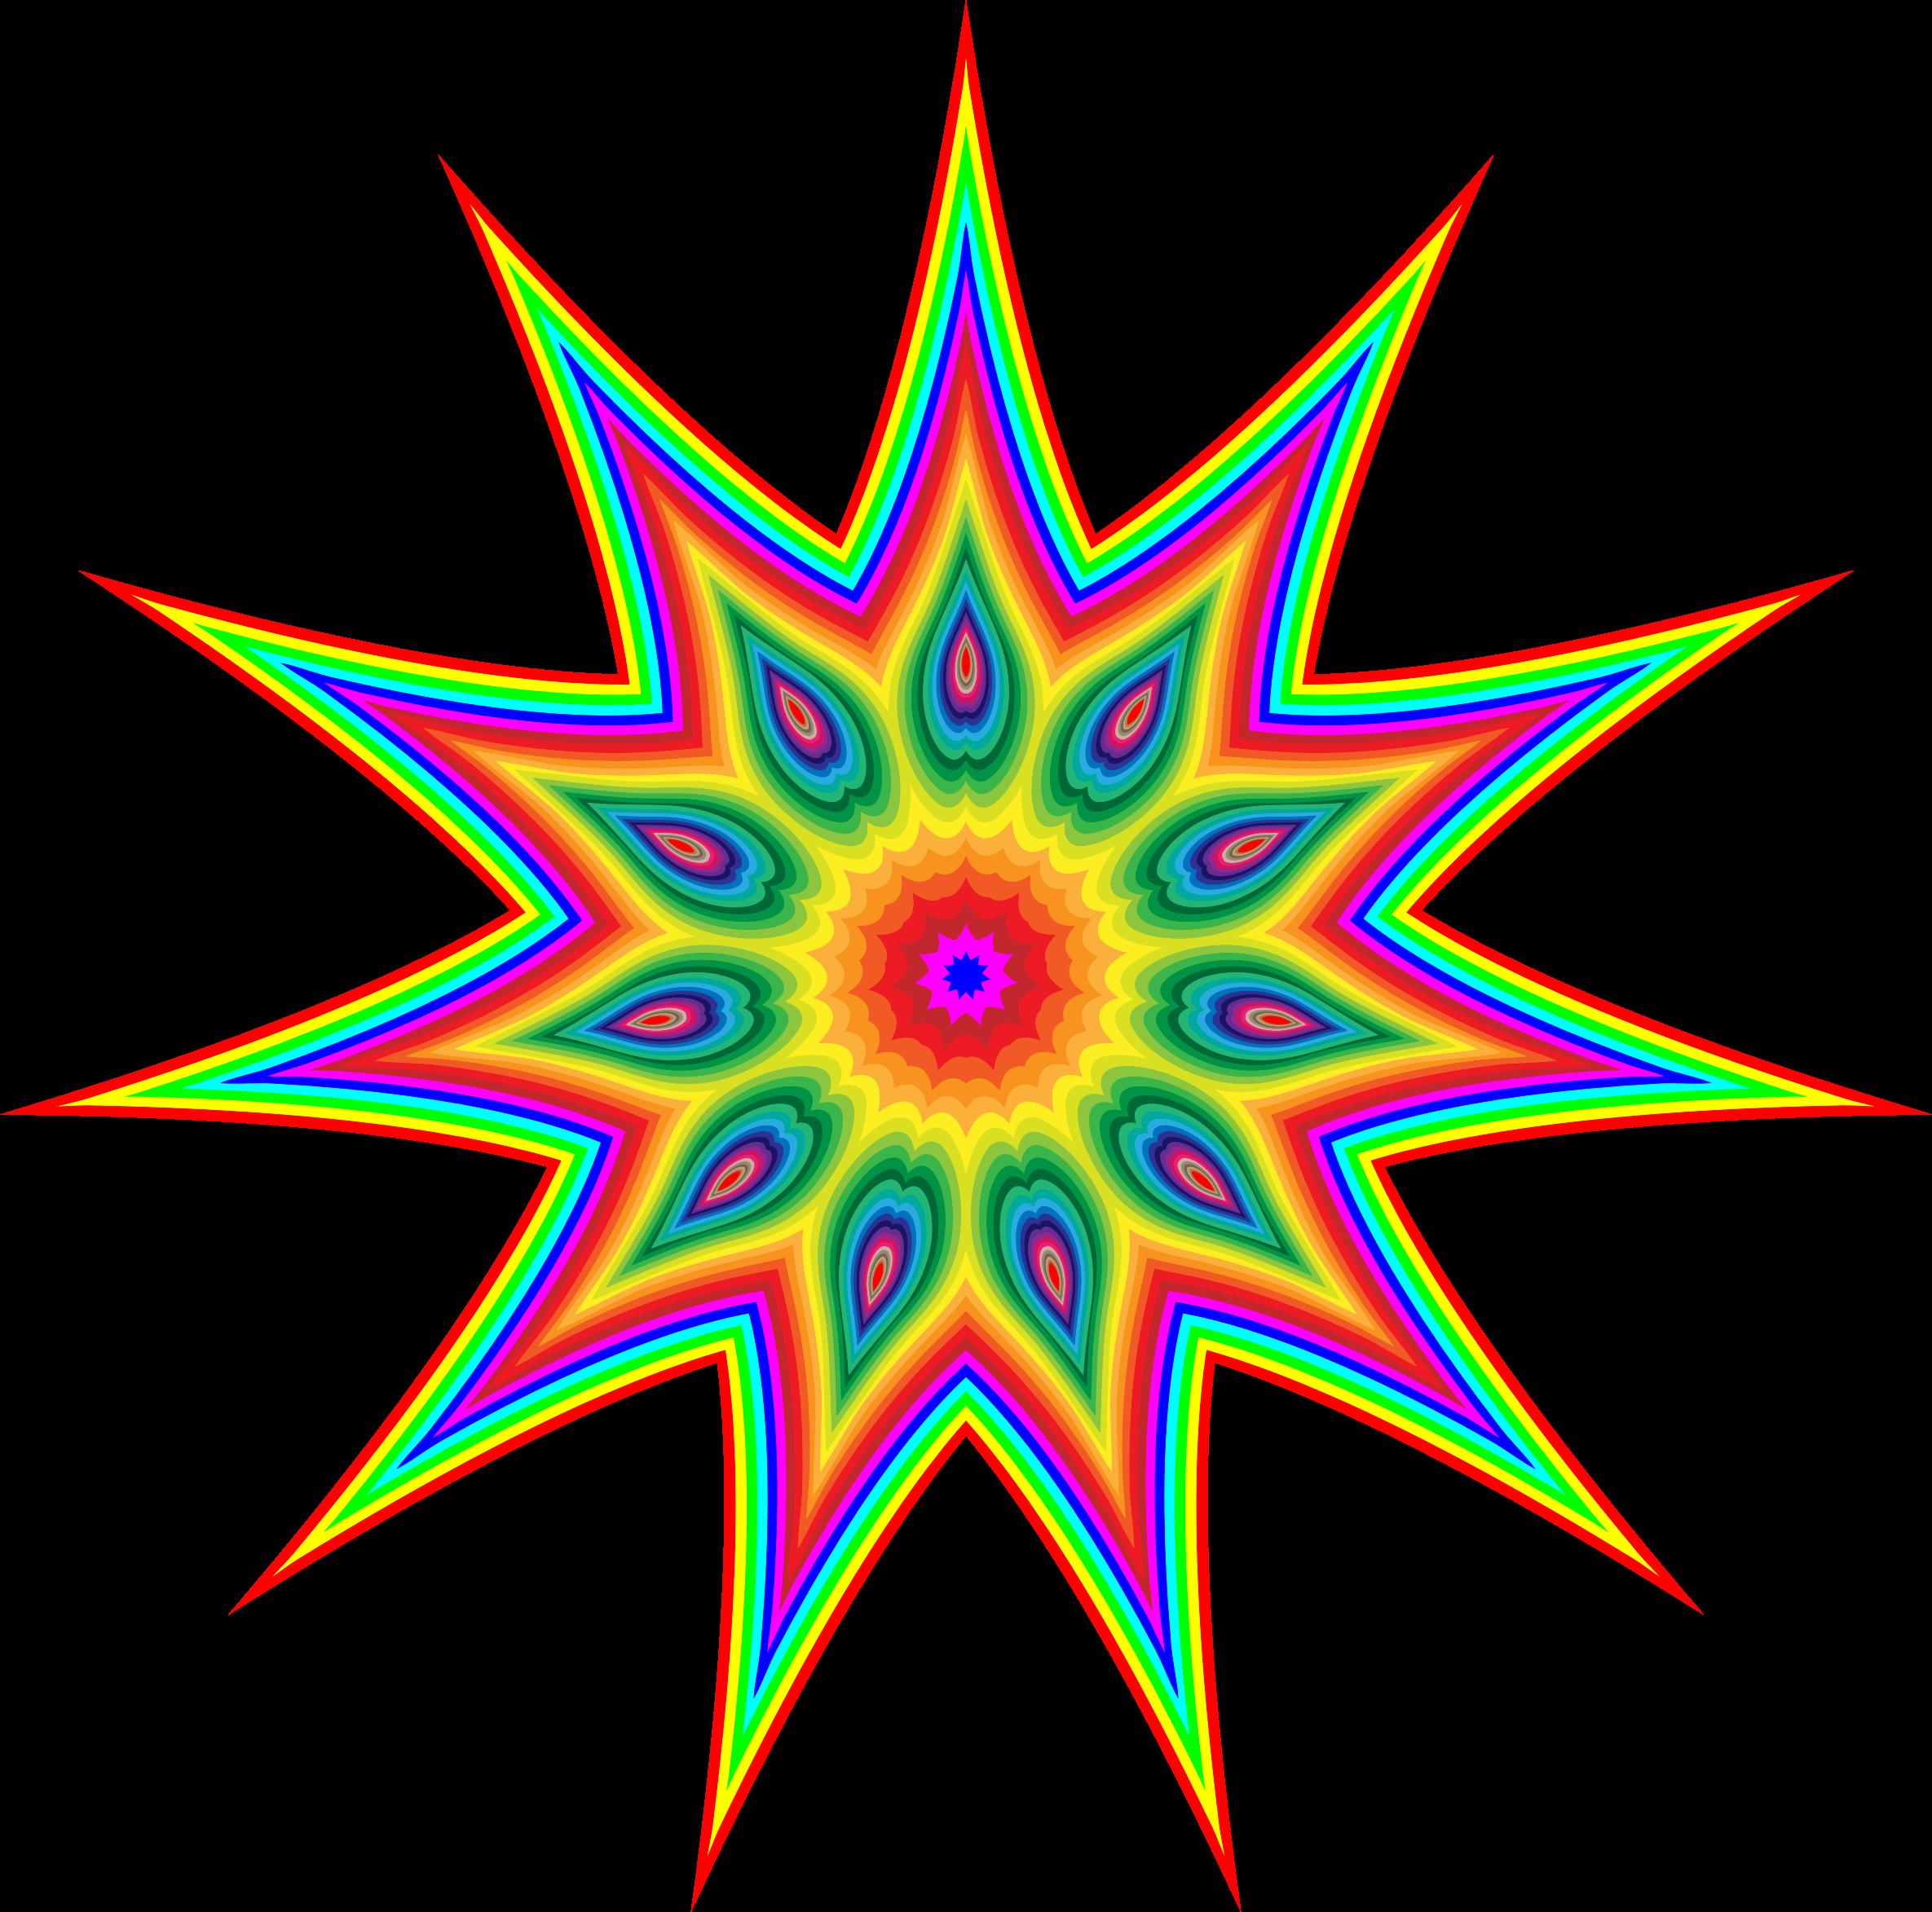 Burst clipart color burst, Burst color burst Transparent.